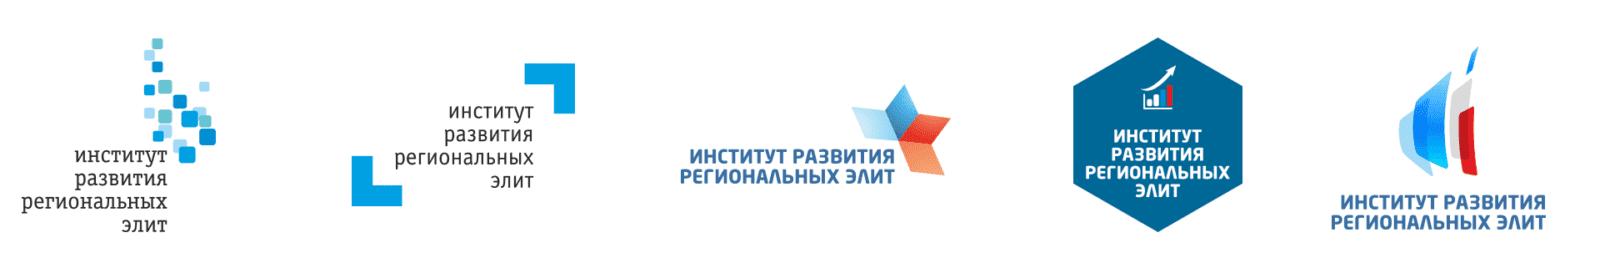 варианты логотипа института РРЭ